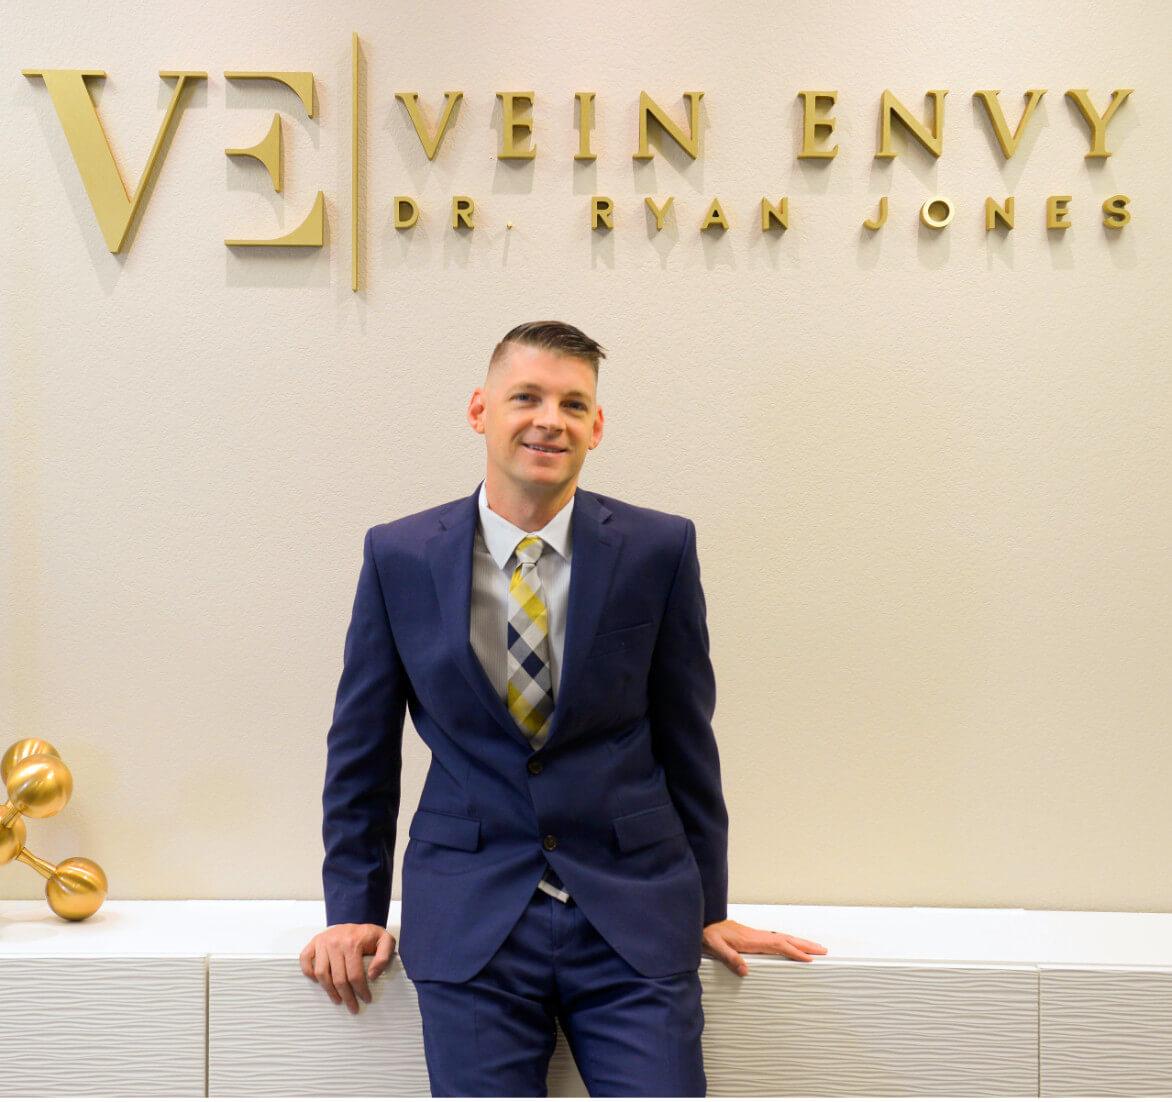 picture of Dr. Jones inside Vein Envy